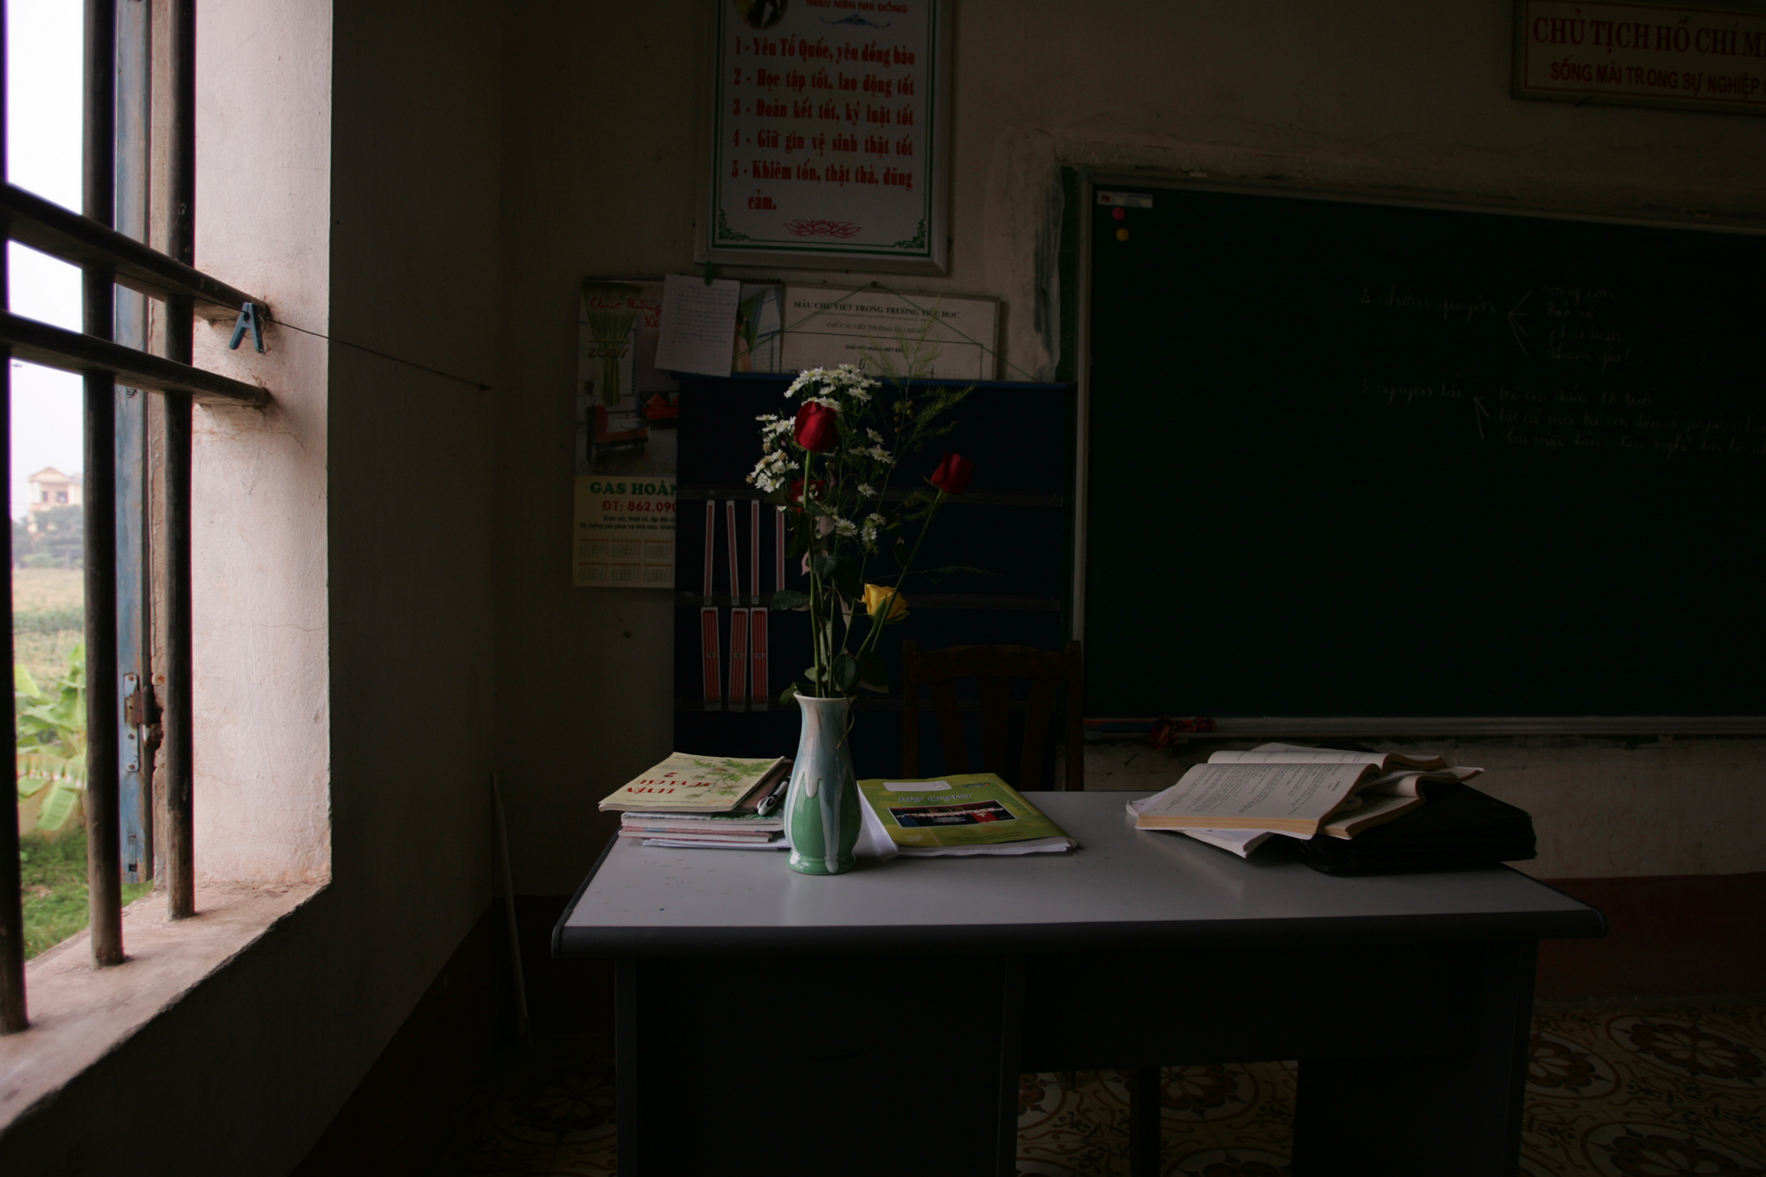 Teachers desk. Vietnam, 2007